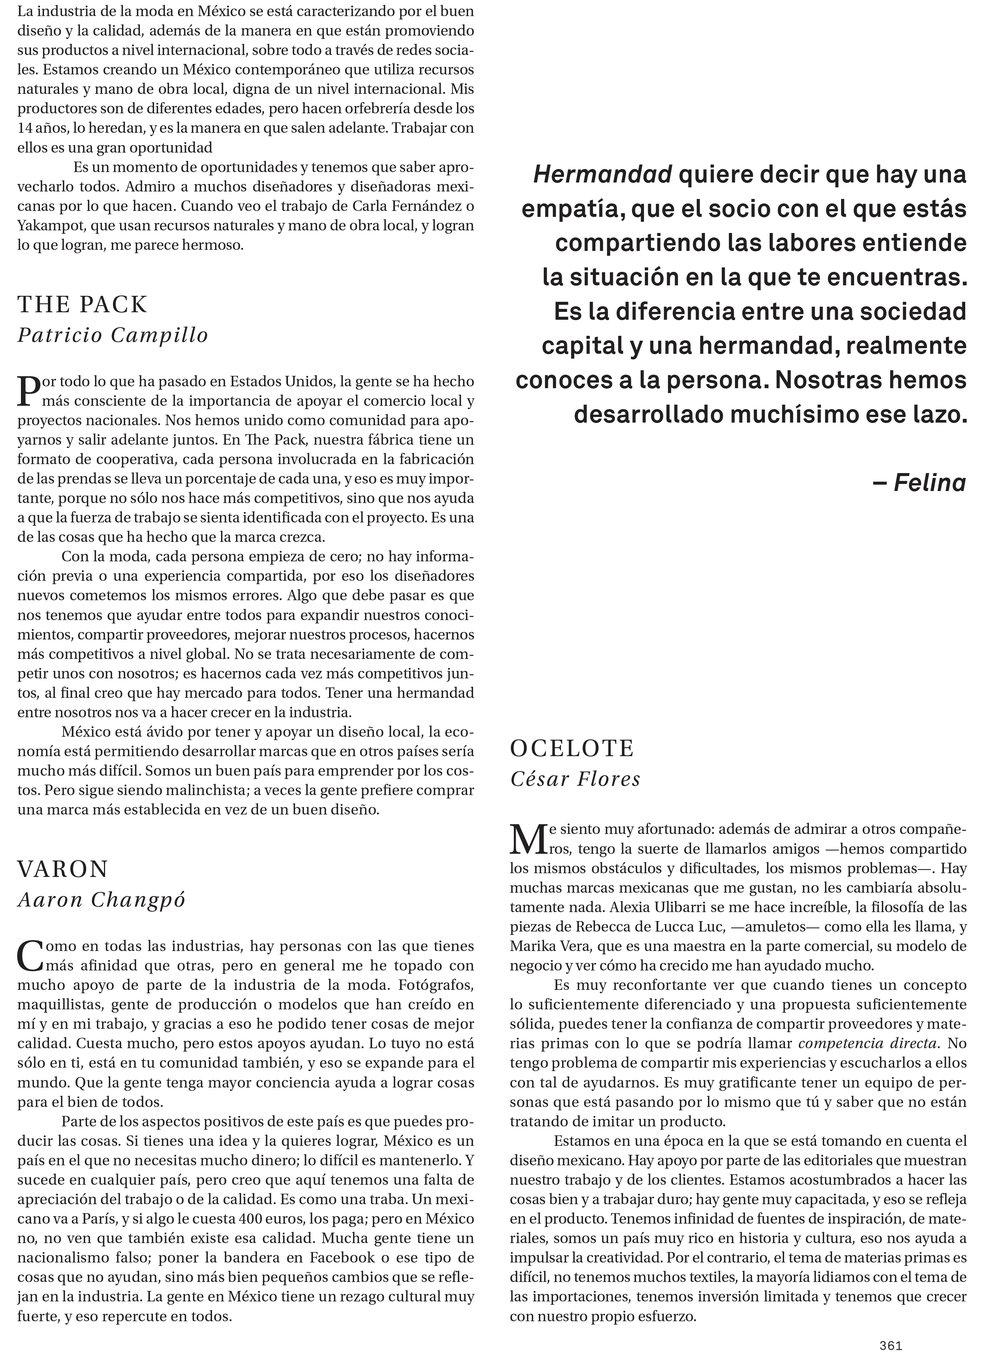 DISEÑADORES MEXICANOS-8.jpg